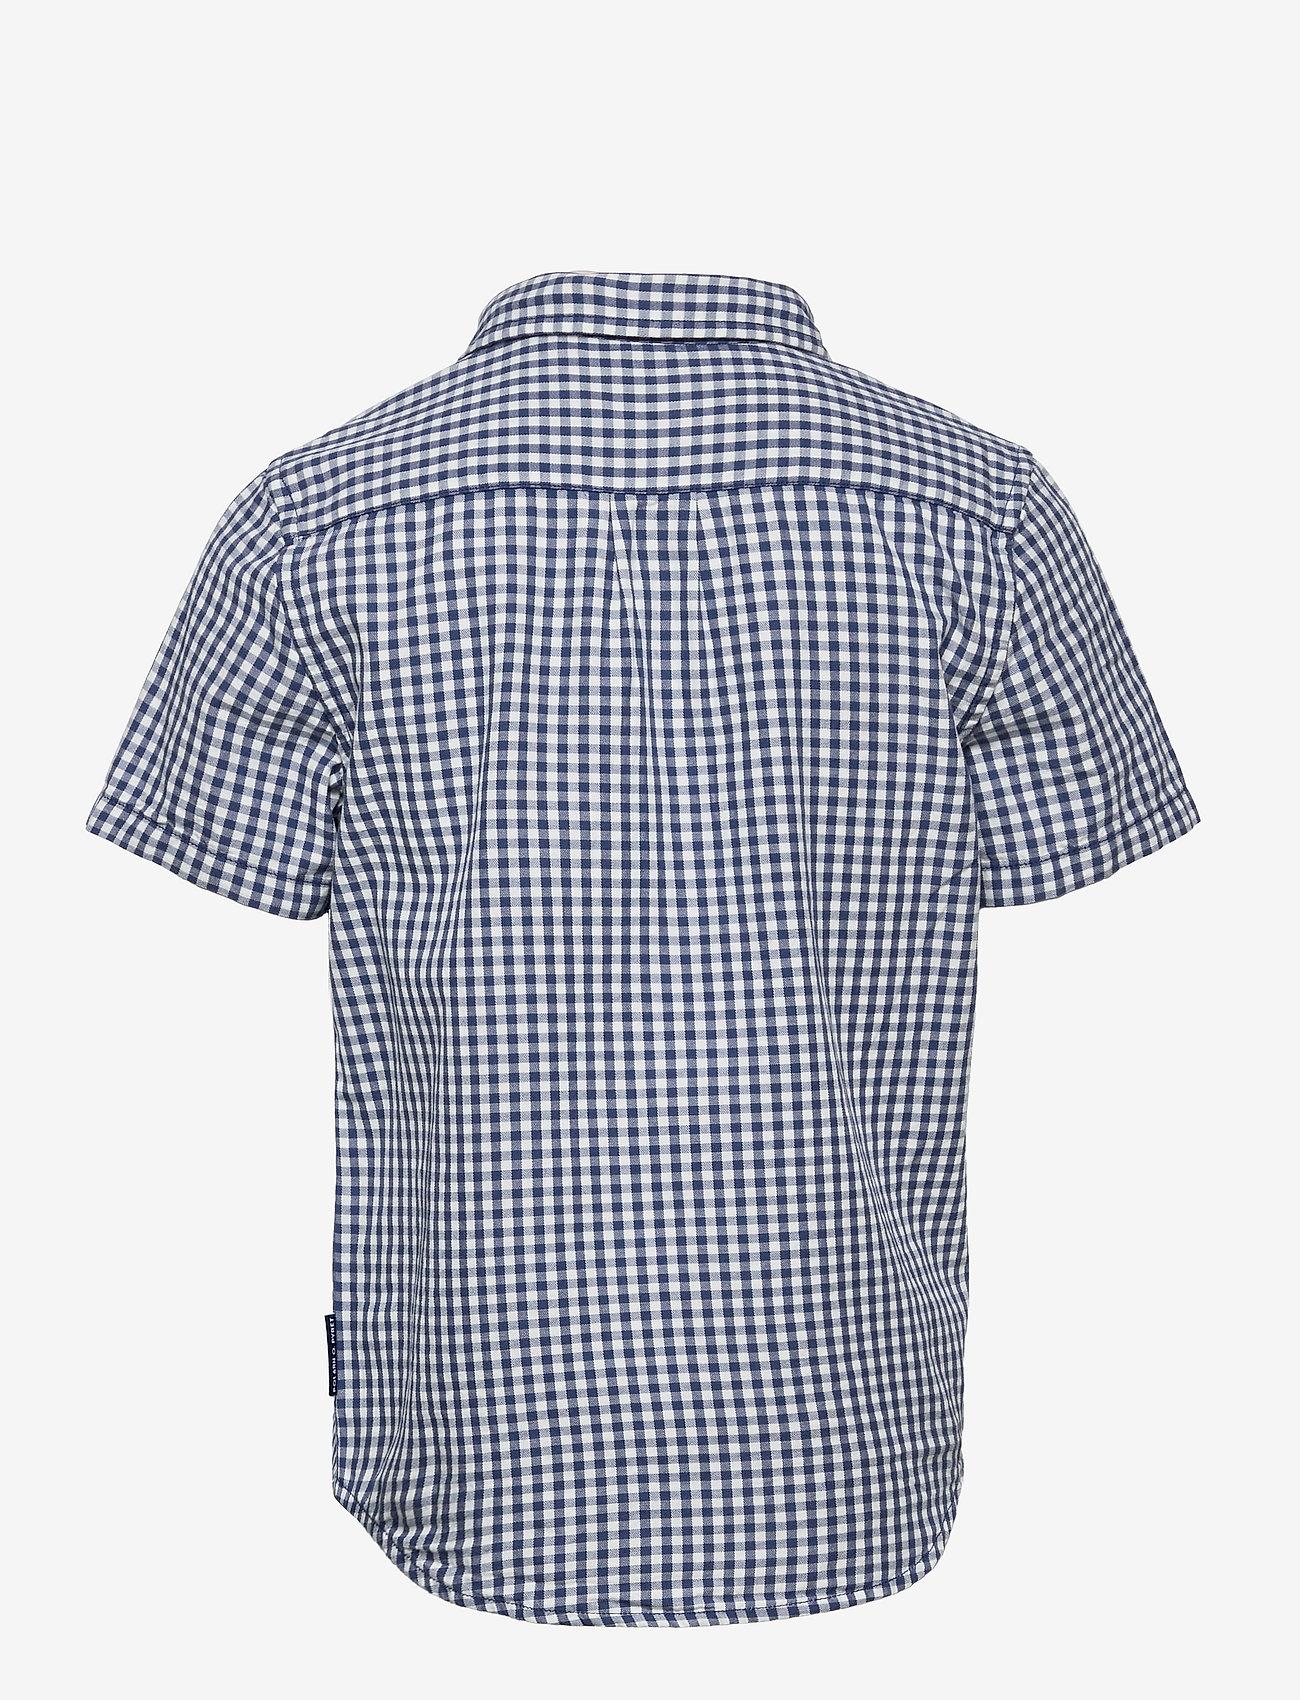 Polarn O. Pyret - Shirt checked s/s School - shirts - ensign blue - 1